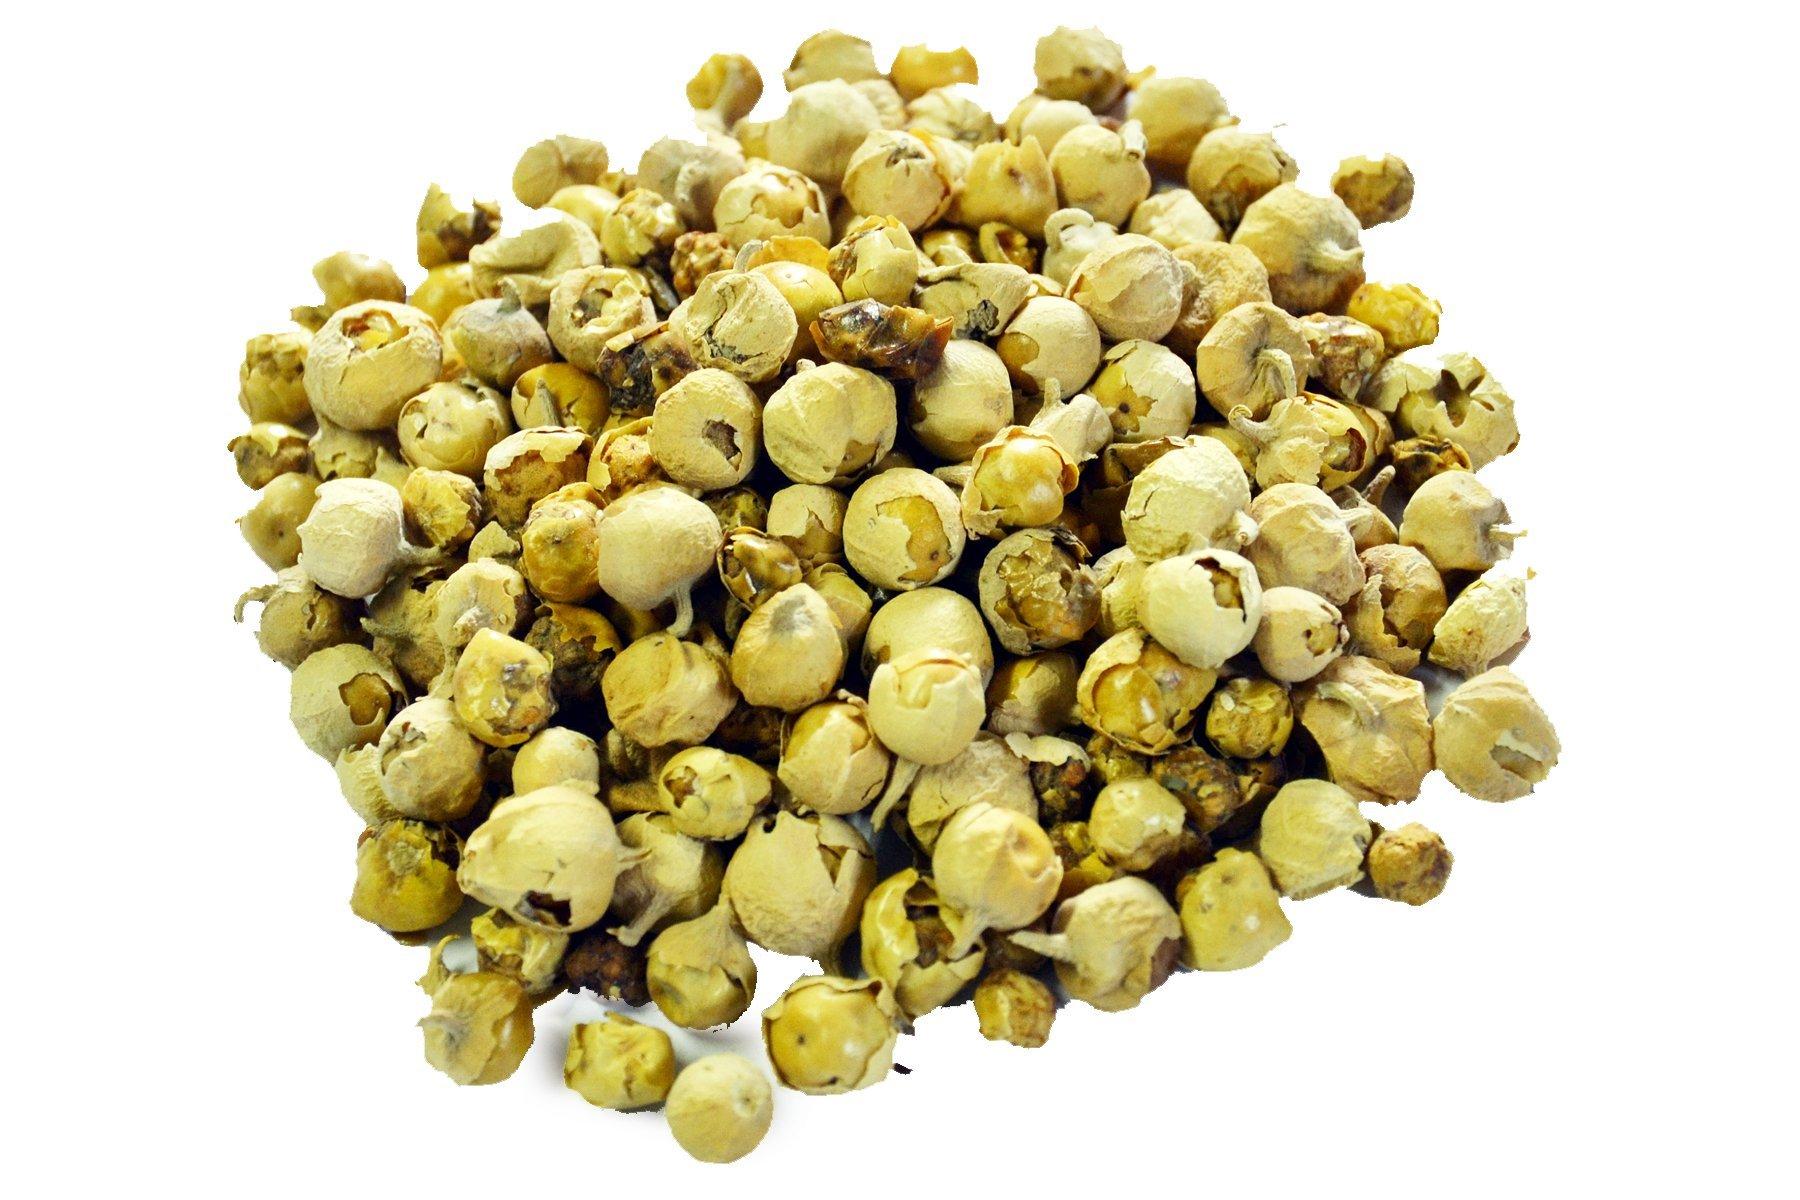 Leeve Dry Fruits Paneer Dodi Indian Rennet Paneer Ka Phool Wthania Coagulans, 800 Grams